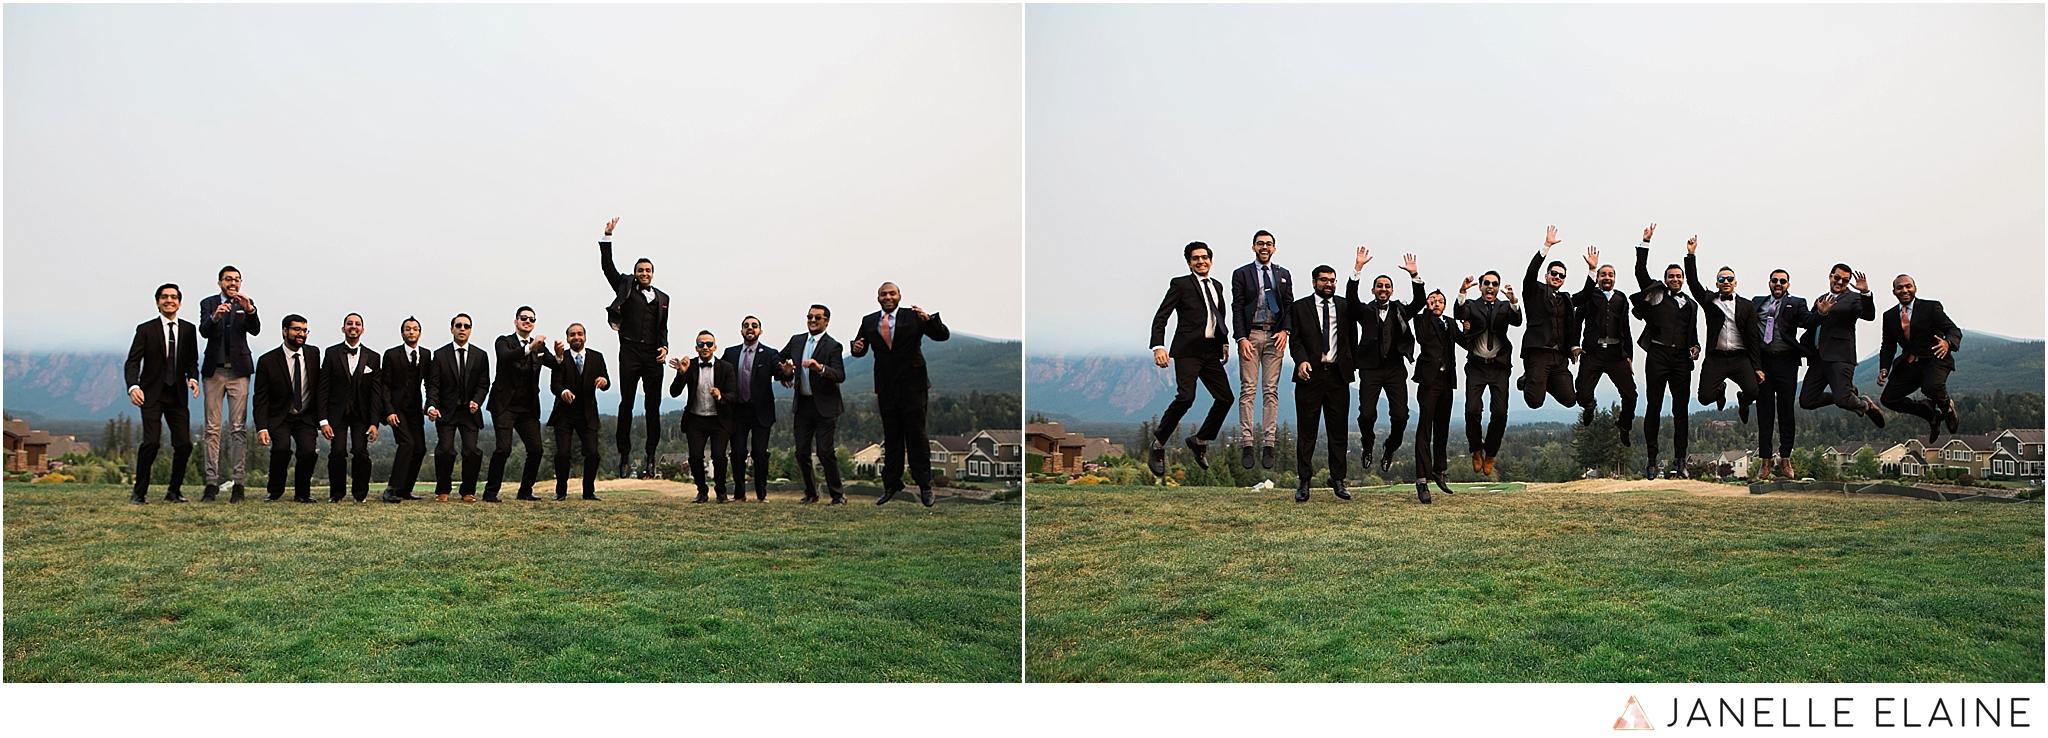 janelle elaine photography-the club at snoqualmie ridge-washington-wedding-photography-rec-7.jpg